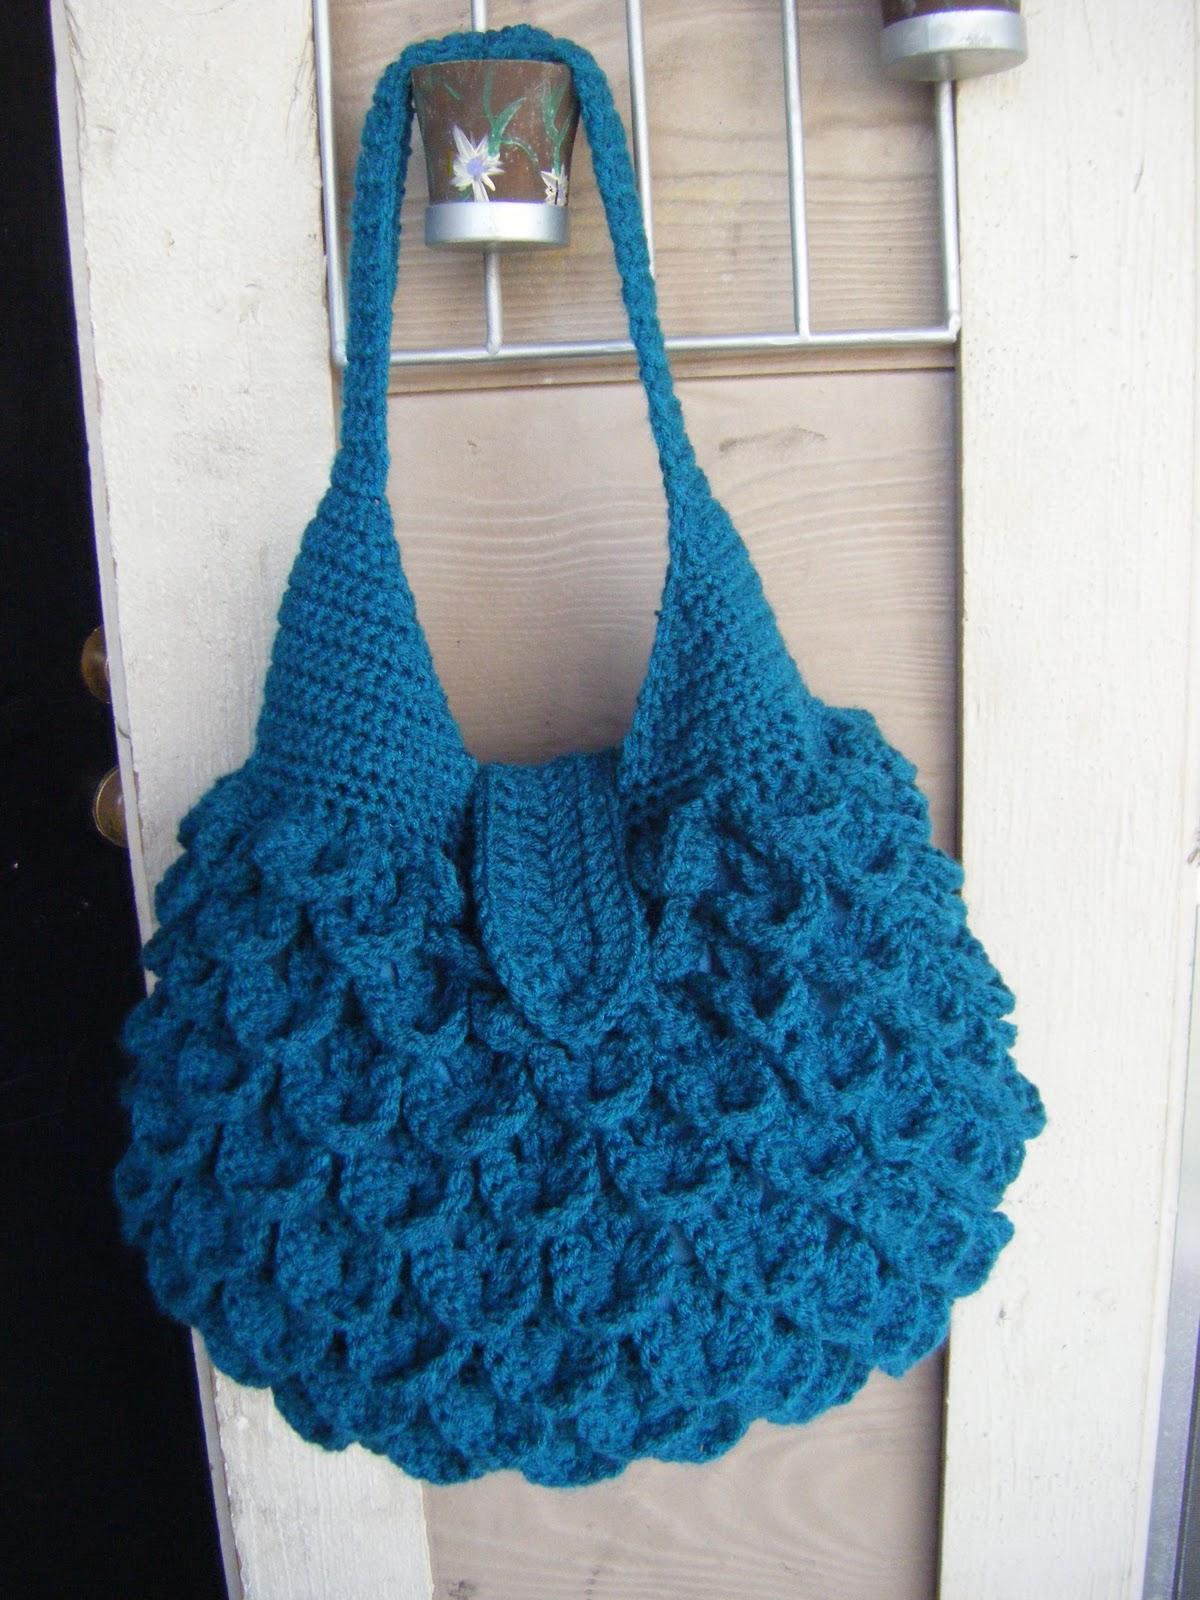 cute free crochet purse patterns free+crochet+purse+patterns+totes | crochet alheabg